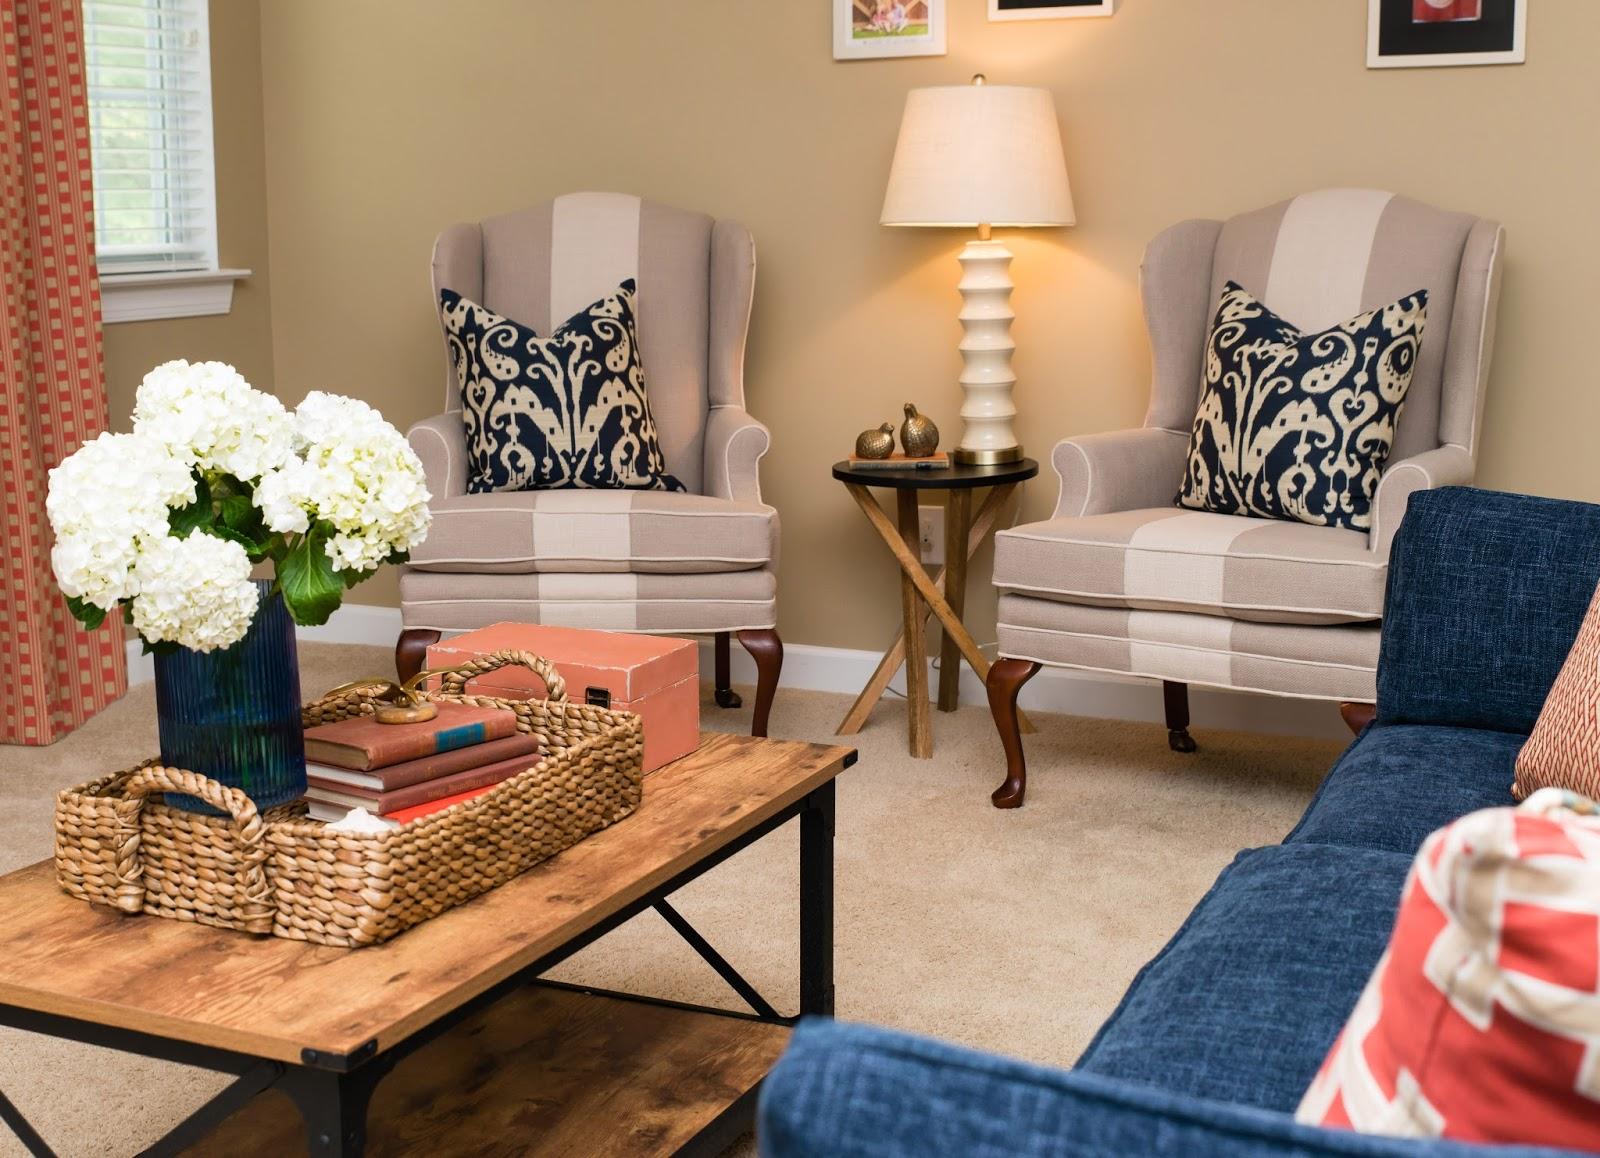 Living Room Set Craigslist Dwell By Cheryl 07 01 2015 08 01 2015